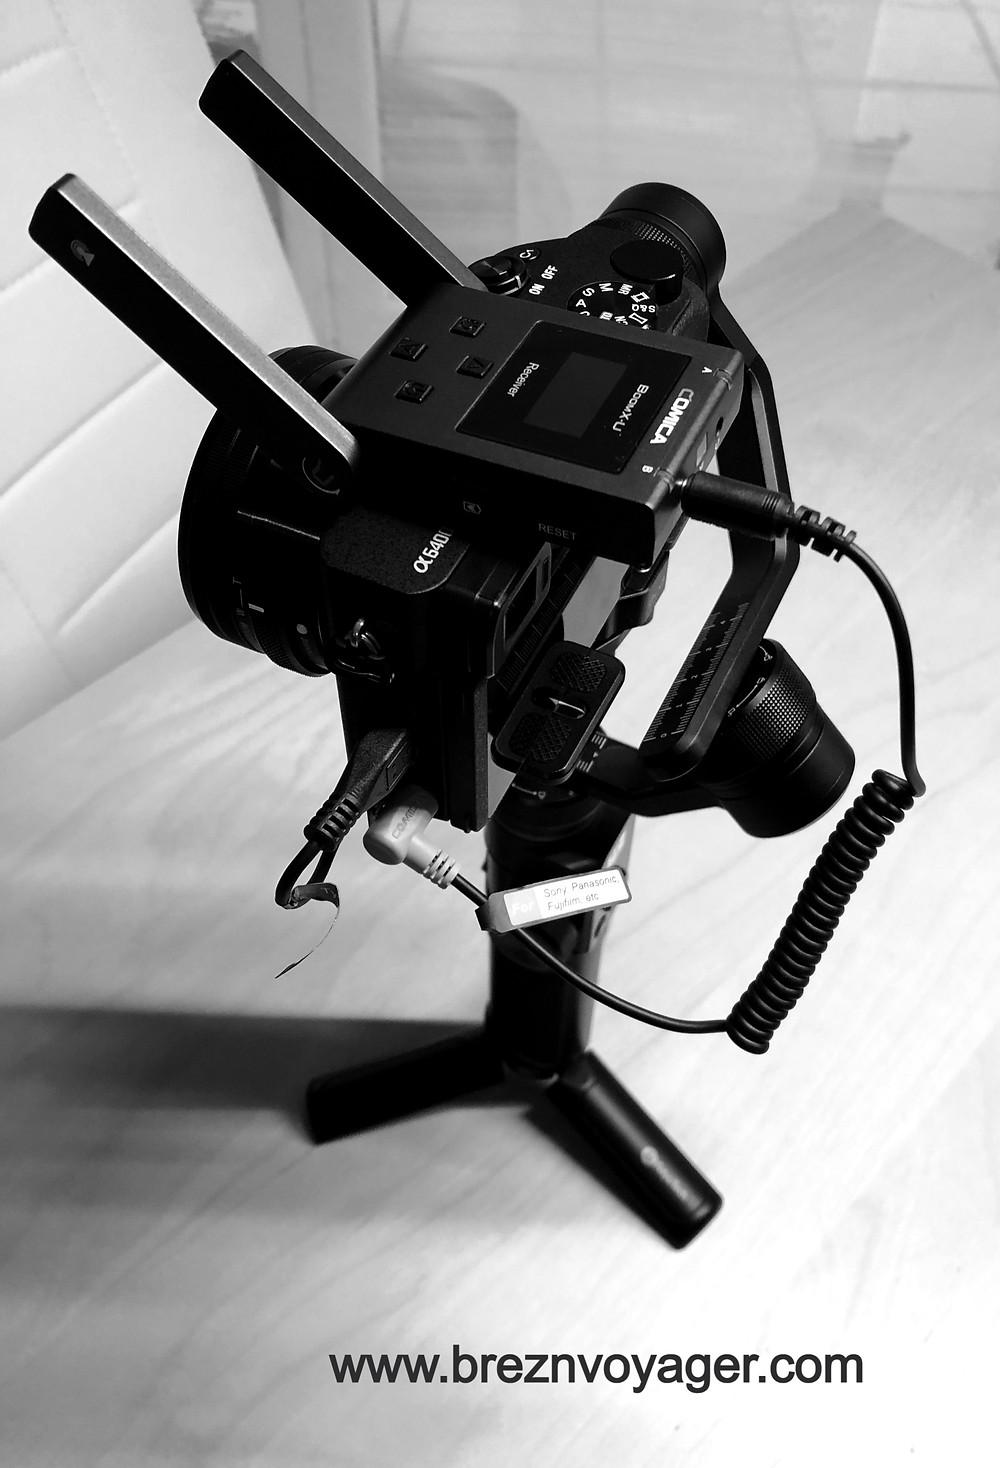 Kamera Sony A6400, Mikrofon Comica Boom X-U, Gimba FeiyuTech